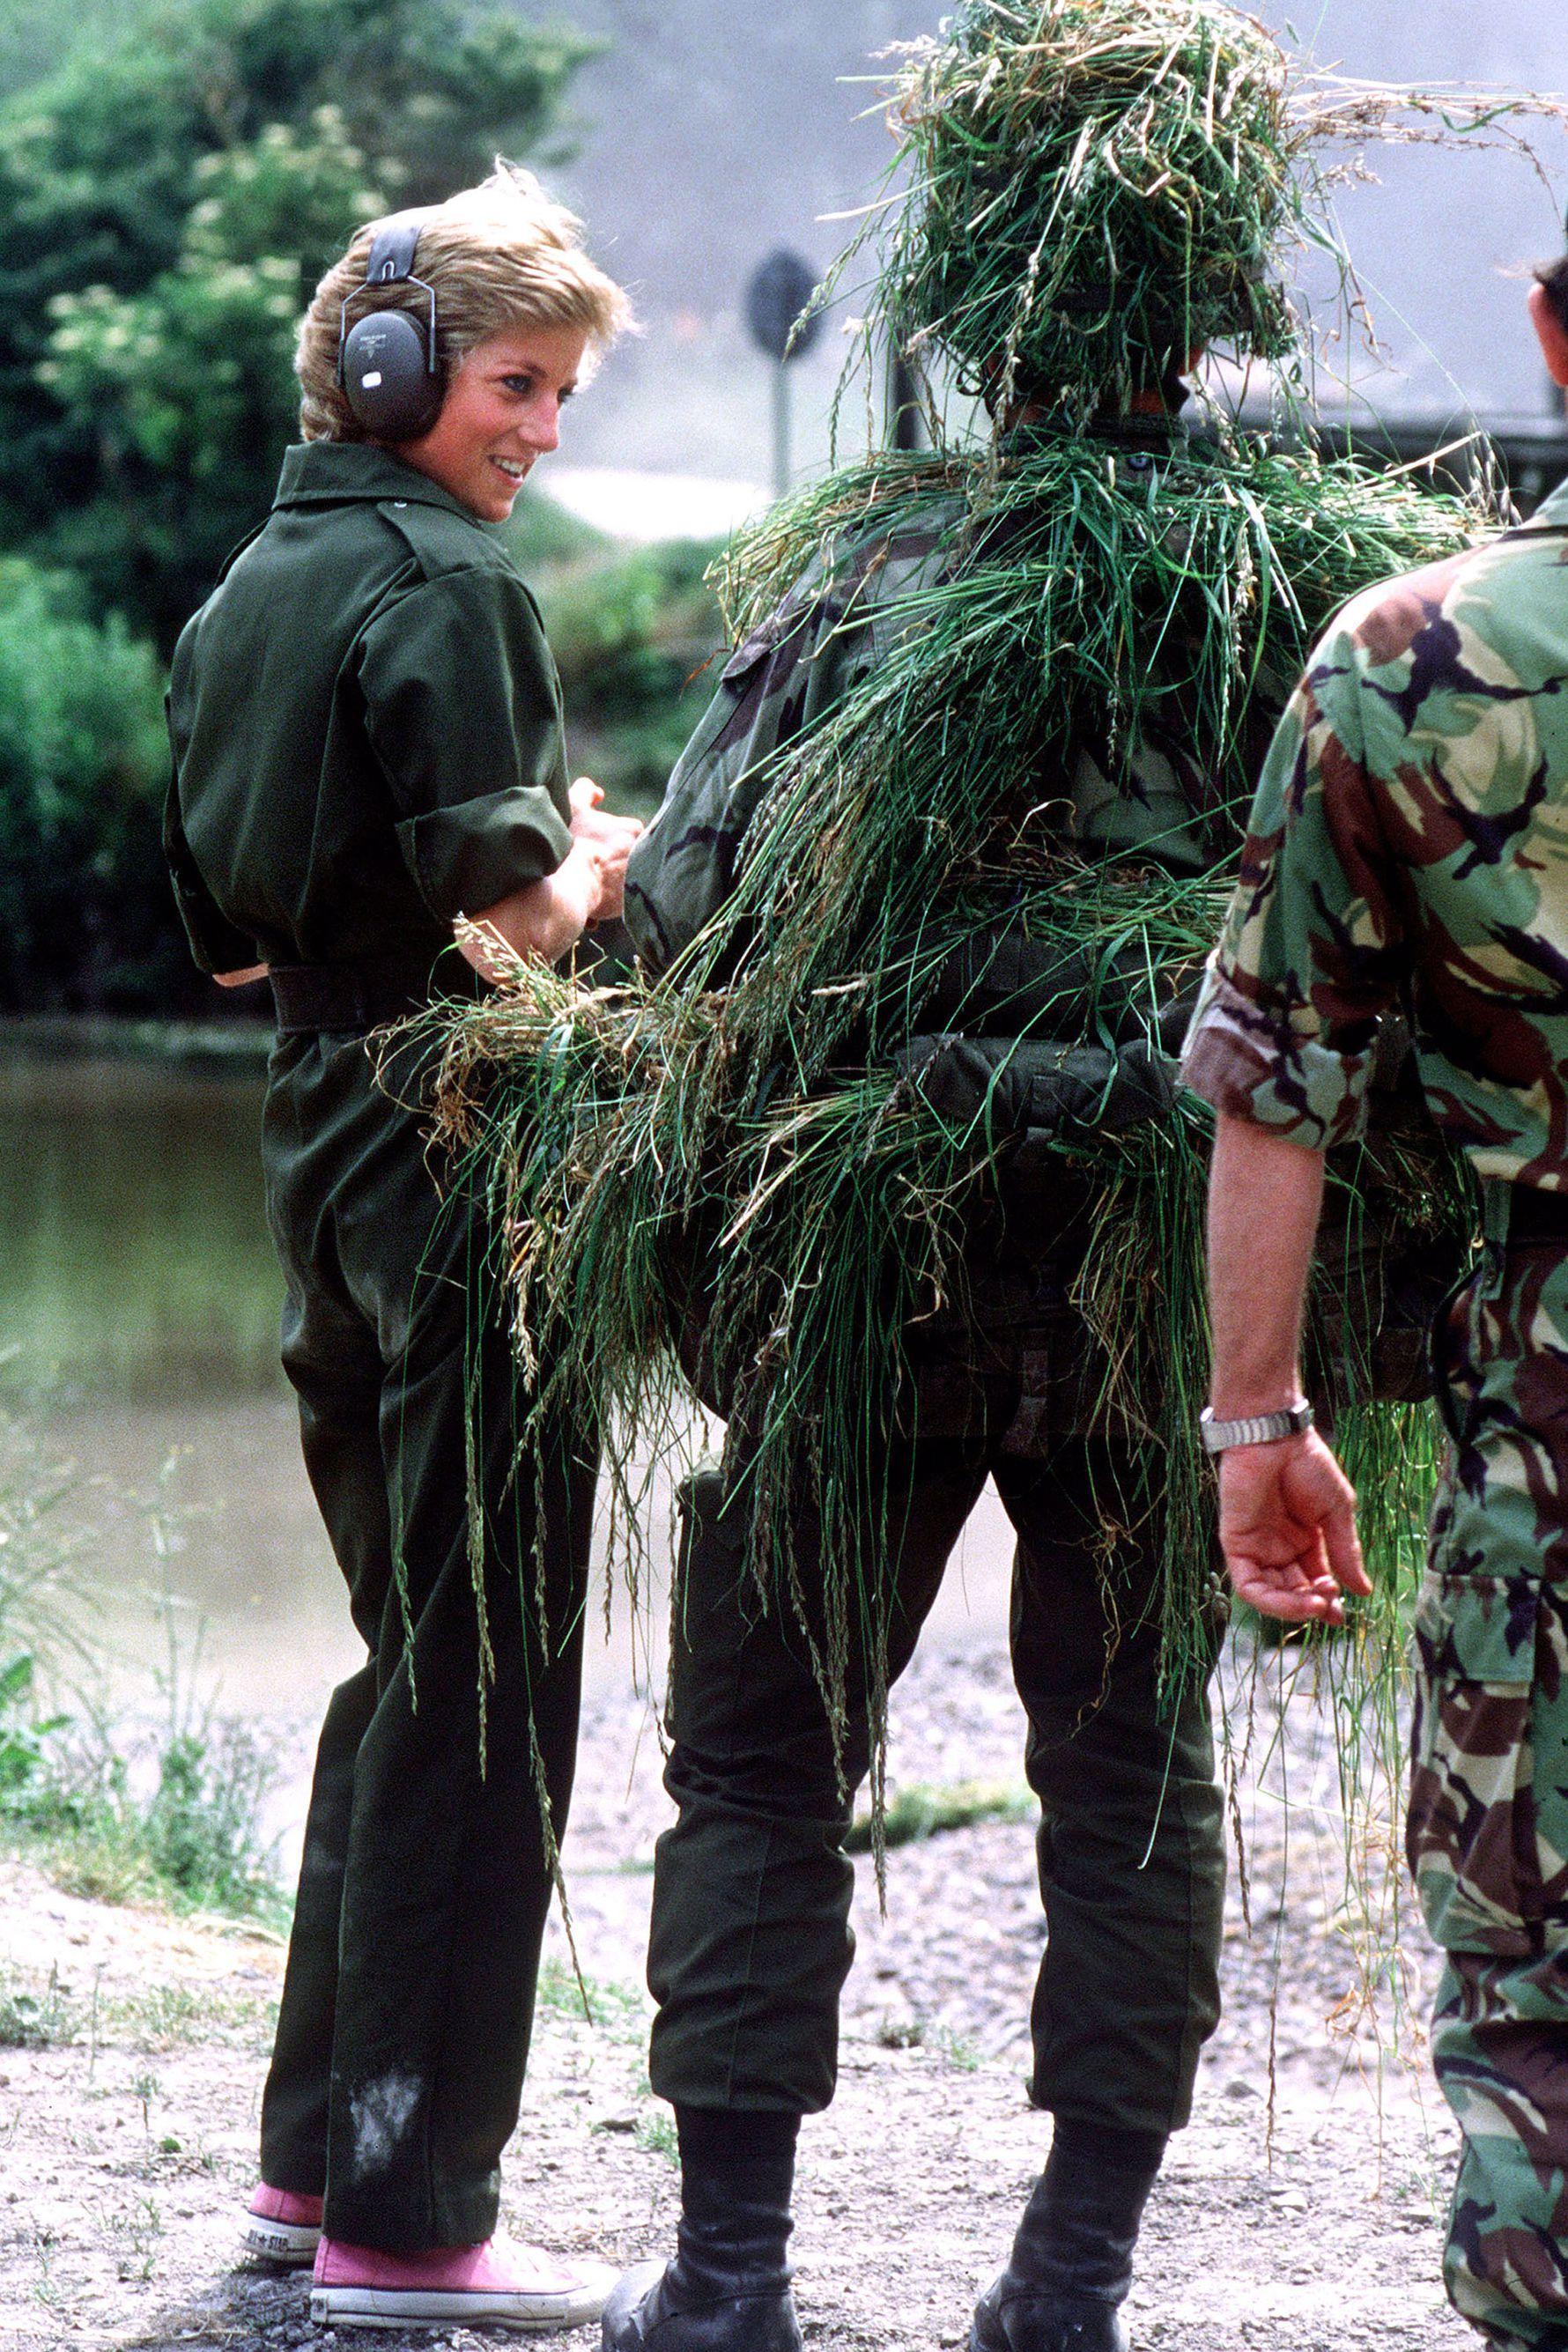 50 Photos of Princess Diana You've Never Seen Before #princessdiana